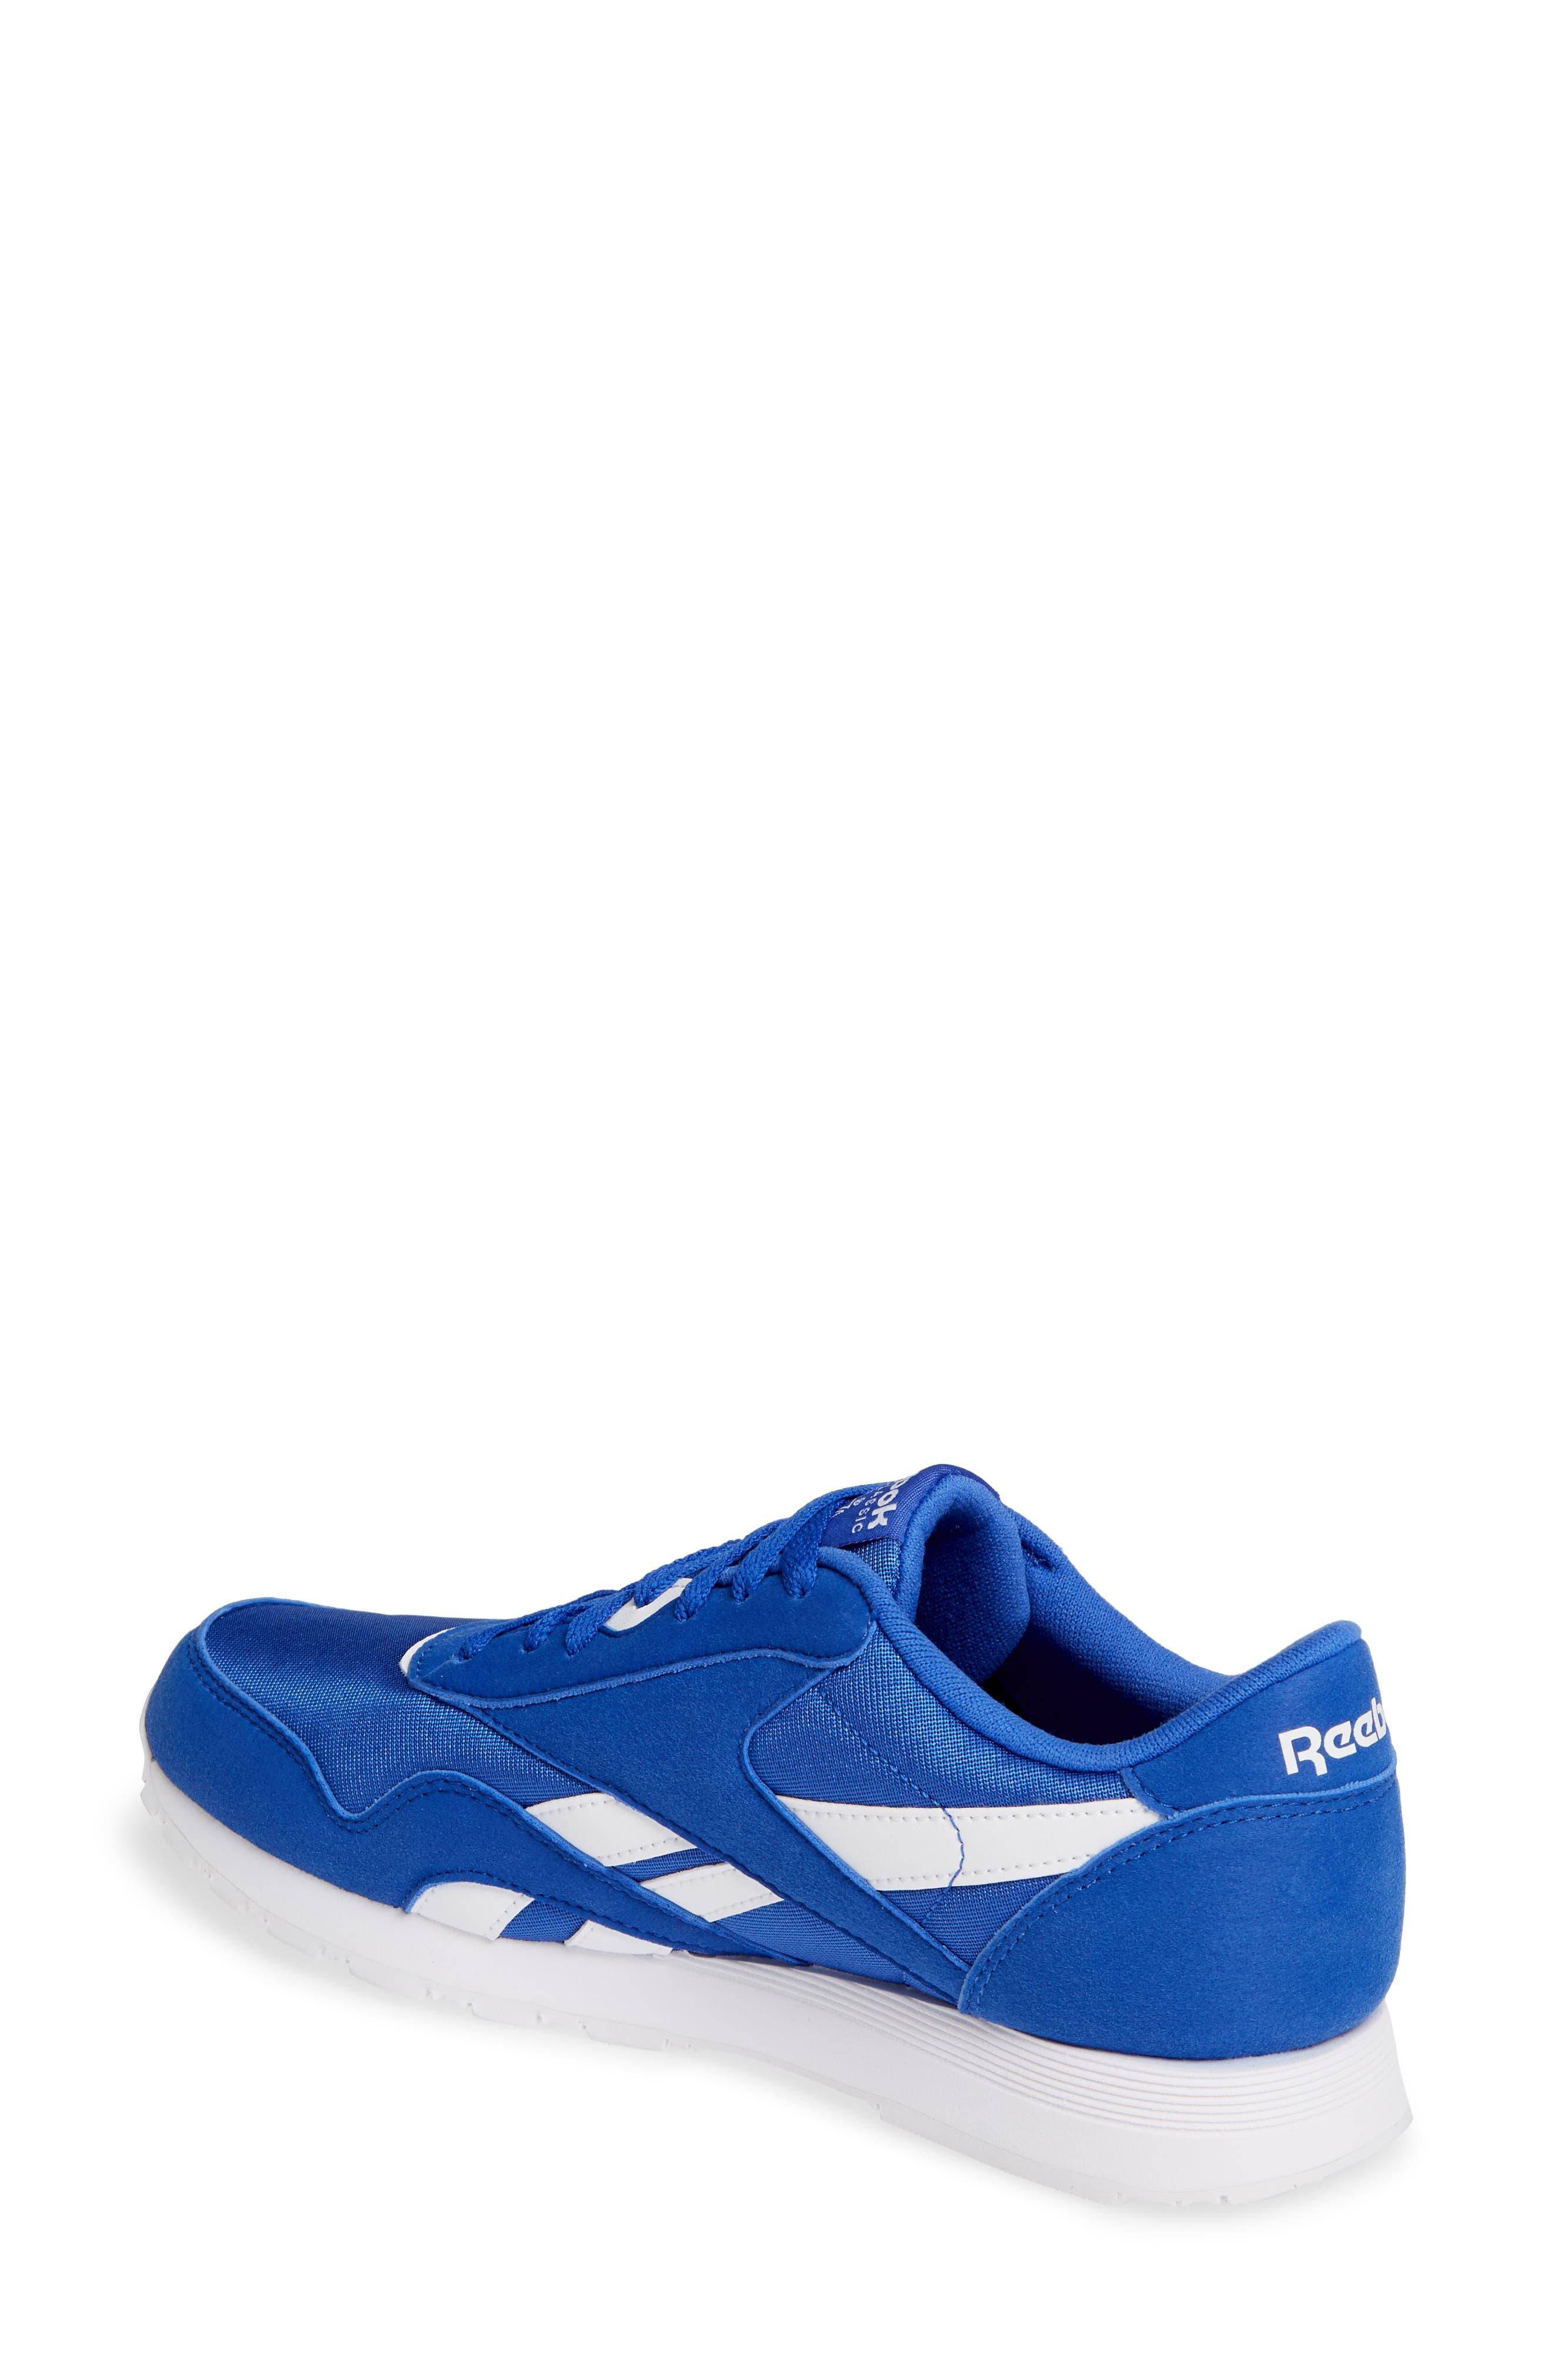 Classic Nylon Sneaker,                             Alternate thumbnail 2, color,                             401